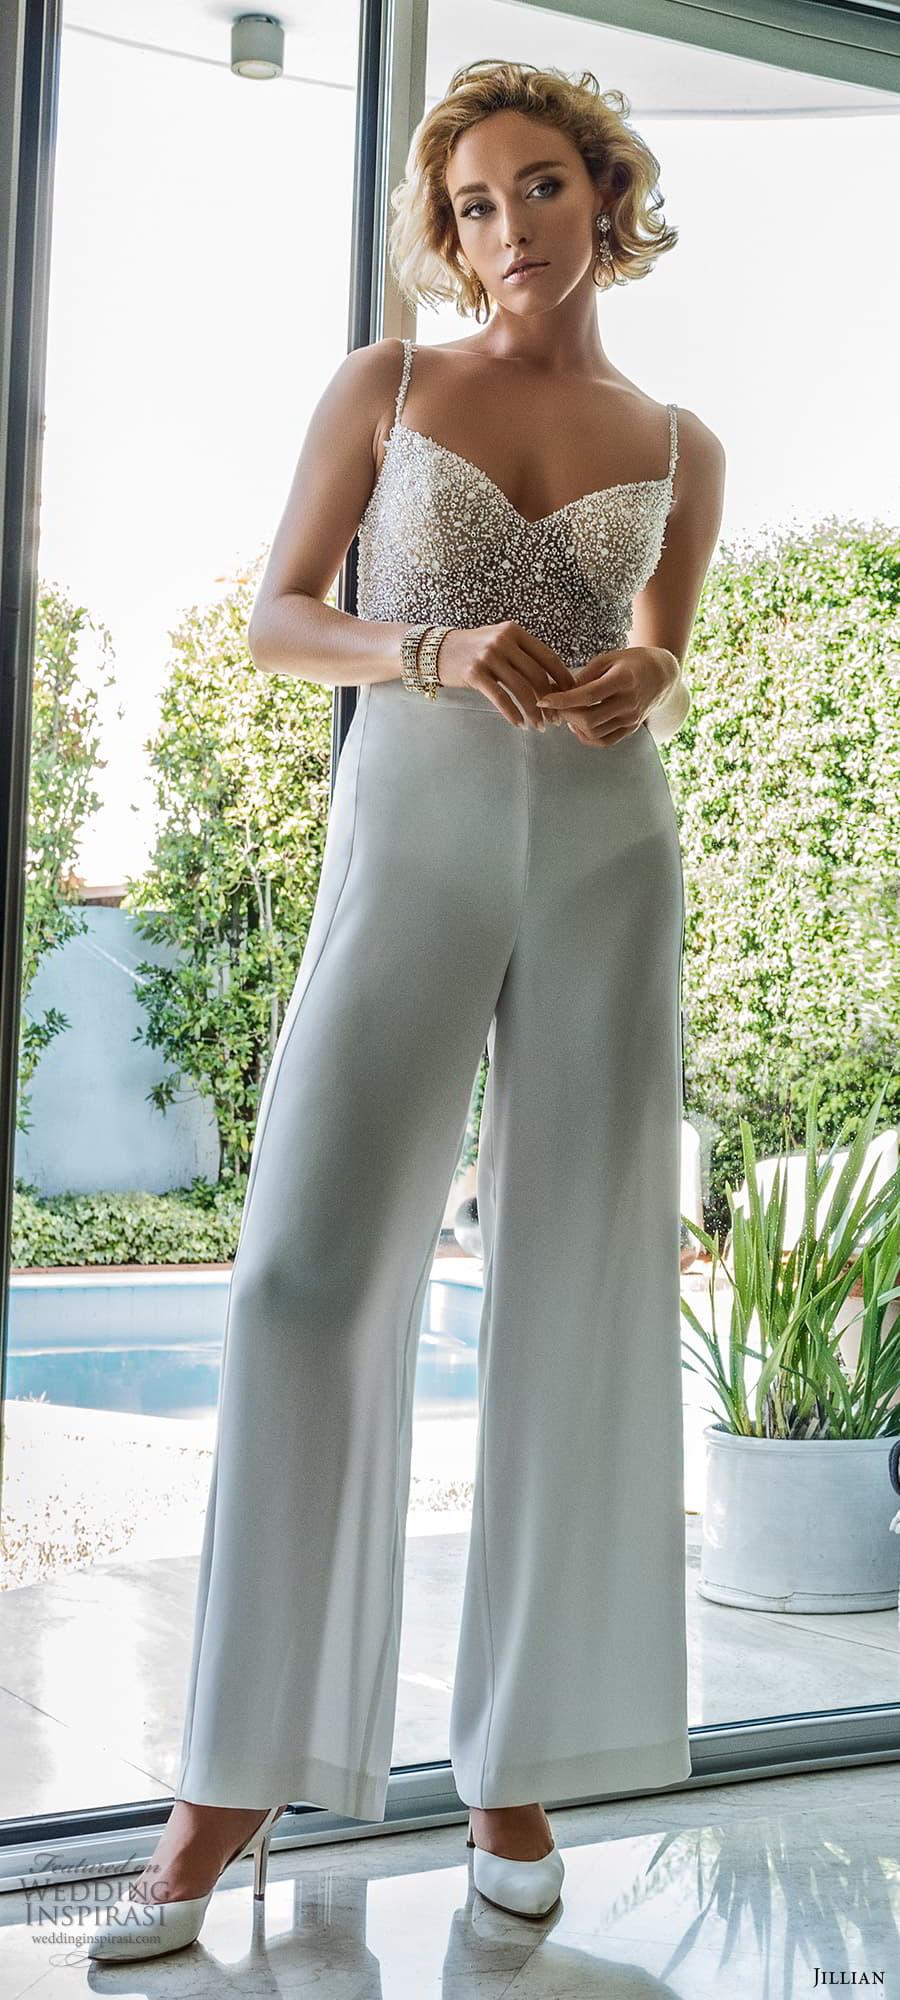 jillian 2022 bridal sleeveless straps sweetheart neckline heavily embellished top bodysuit pants trouser wedding dress (3) mv